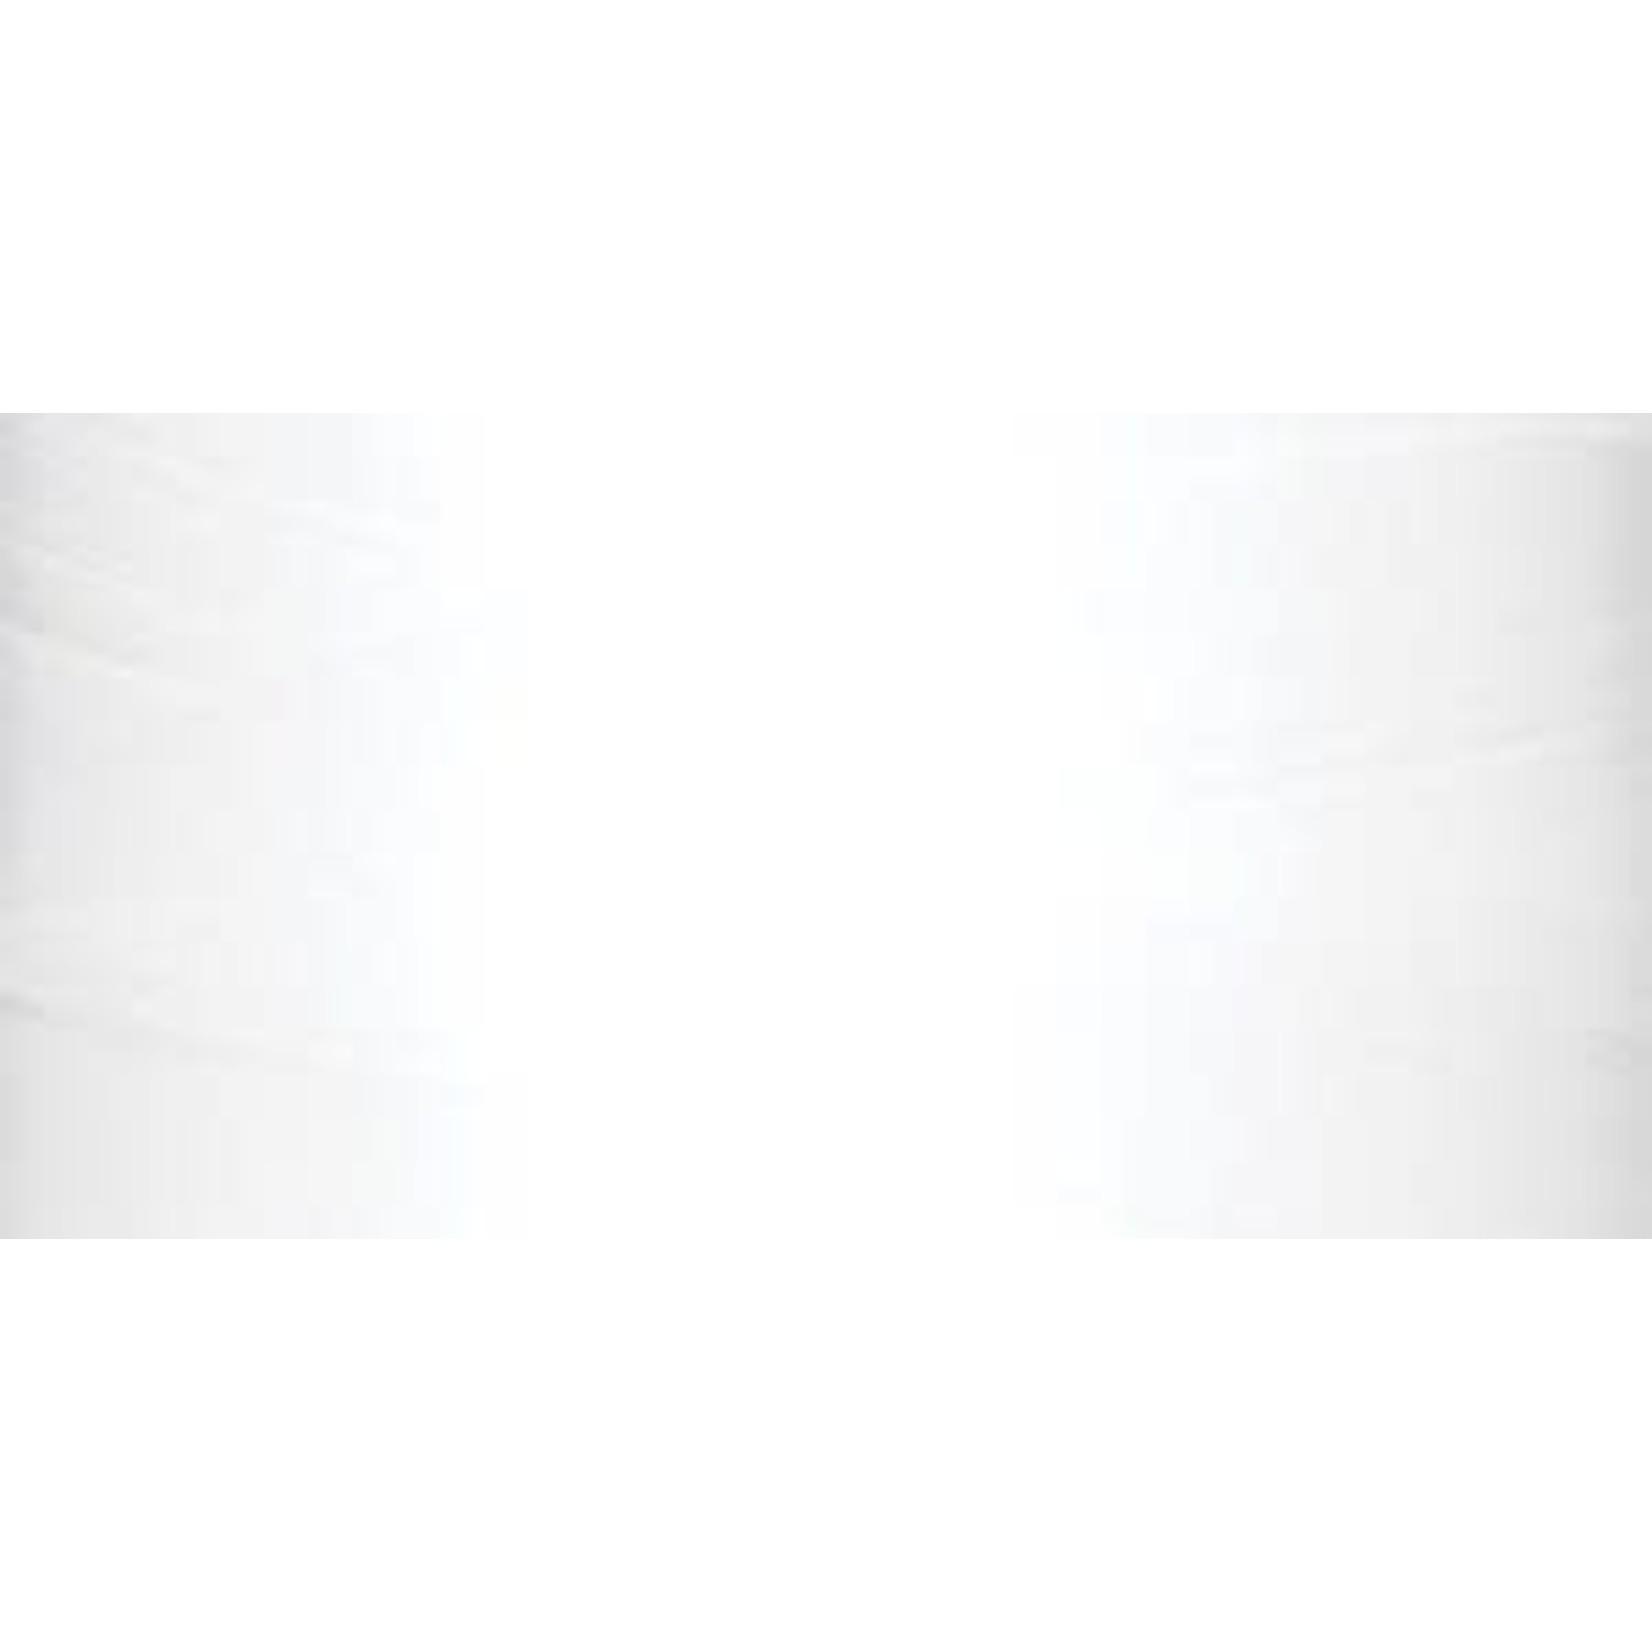 Superior Threads Bottom Line - #60 - 1300 m - 621 Lace White